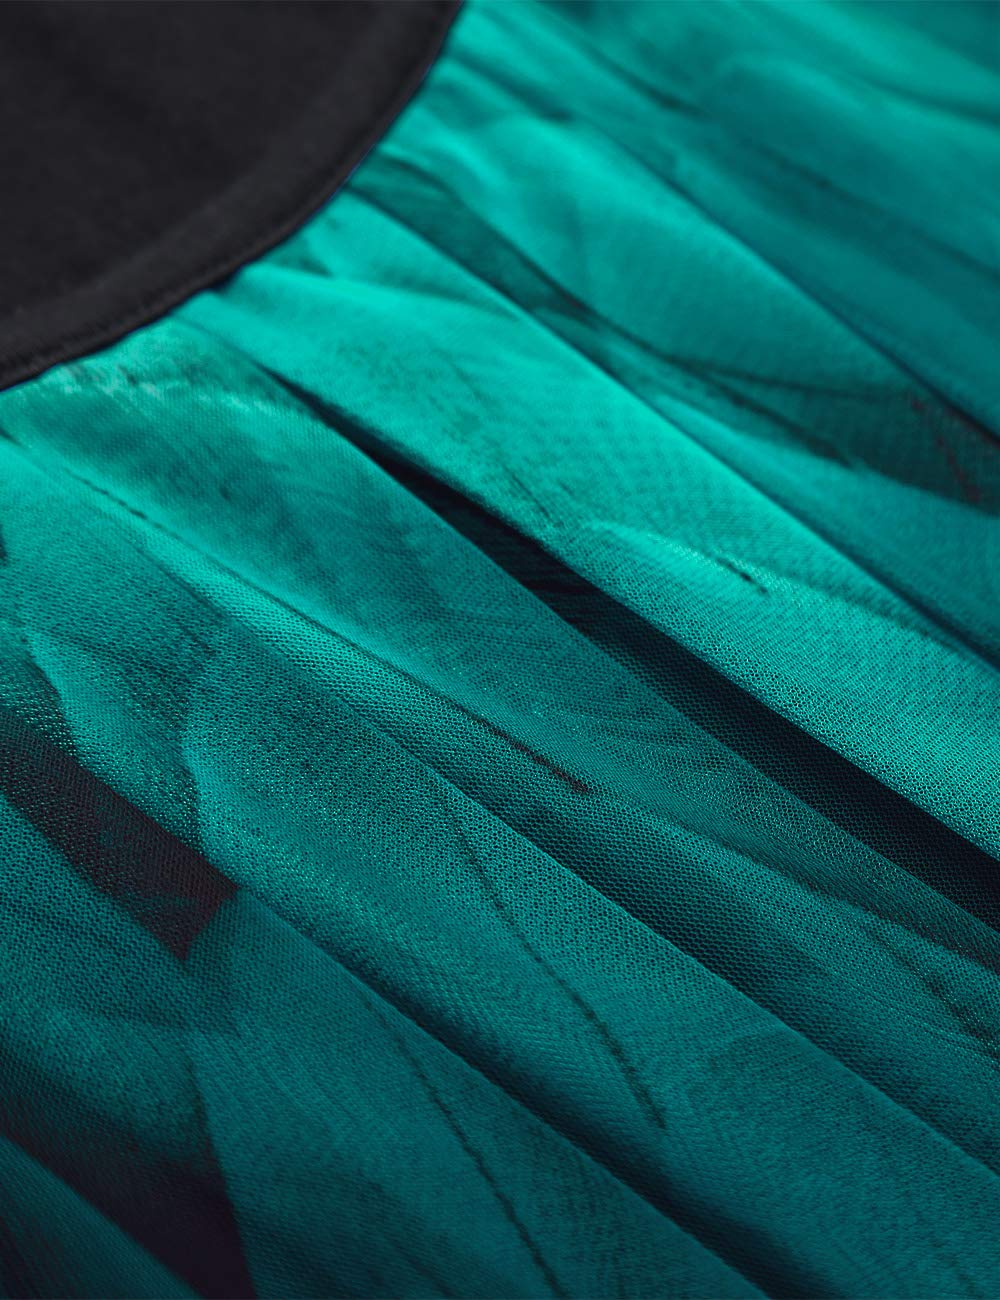 BAISHENGGT dam veck kort ärm tunika batwing rund krage blus Pfau Blau